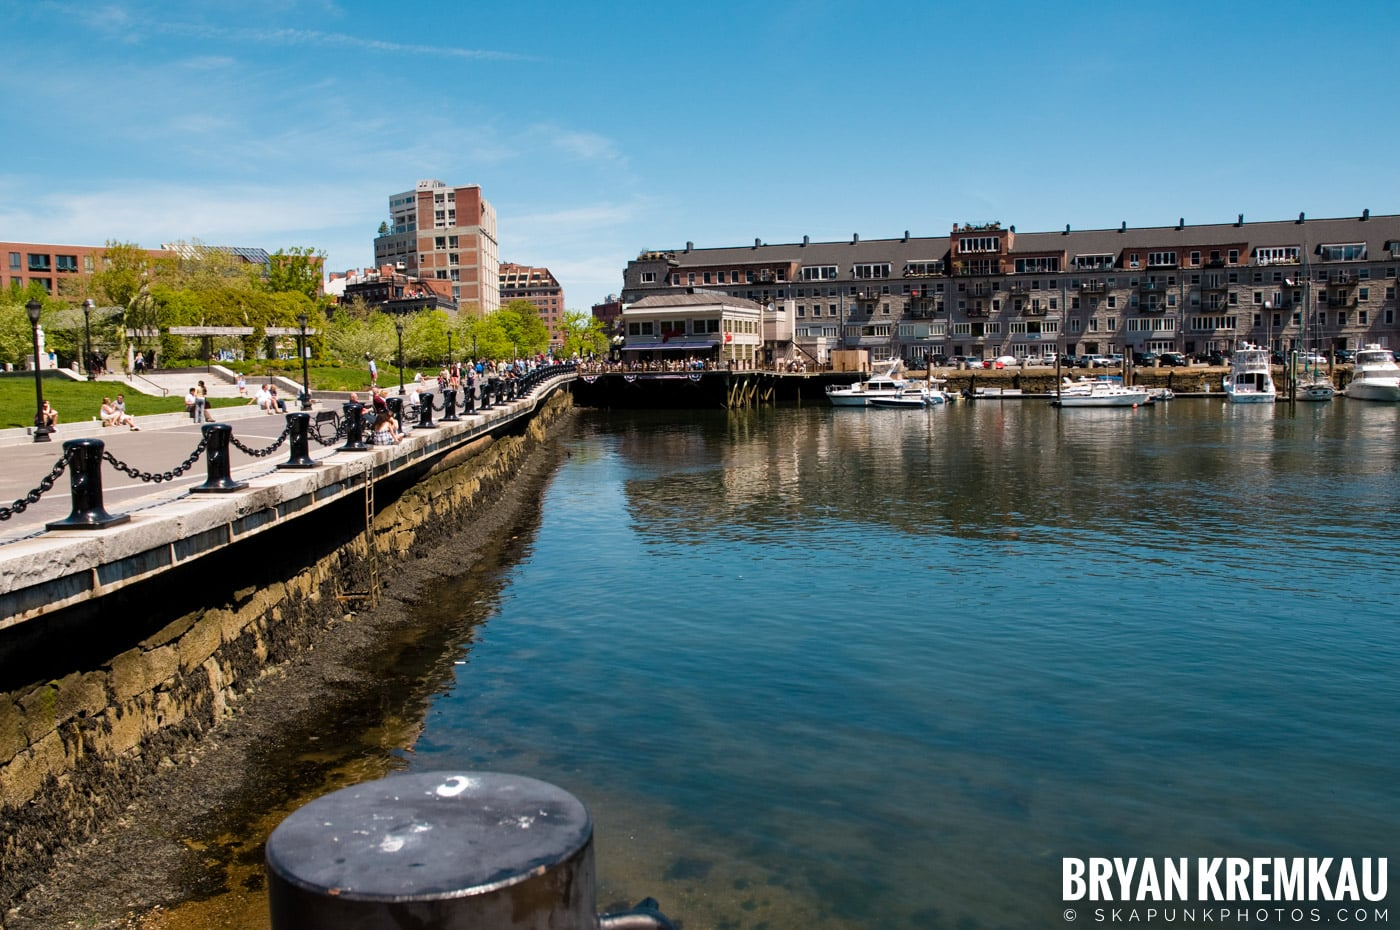 Memorial Day Weekend Trip to Boston - 5.25.08 (23)